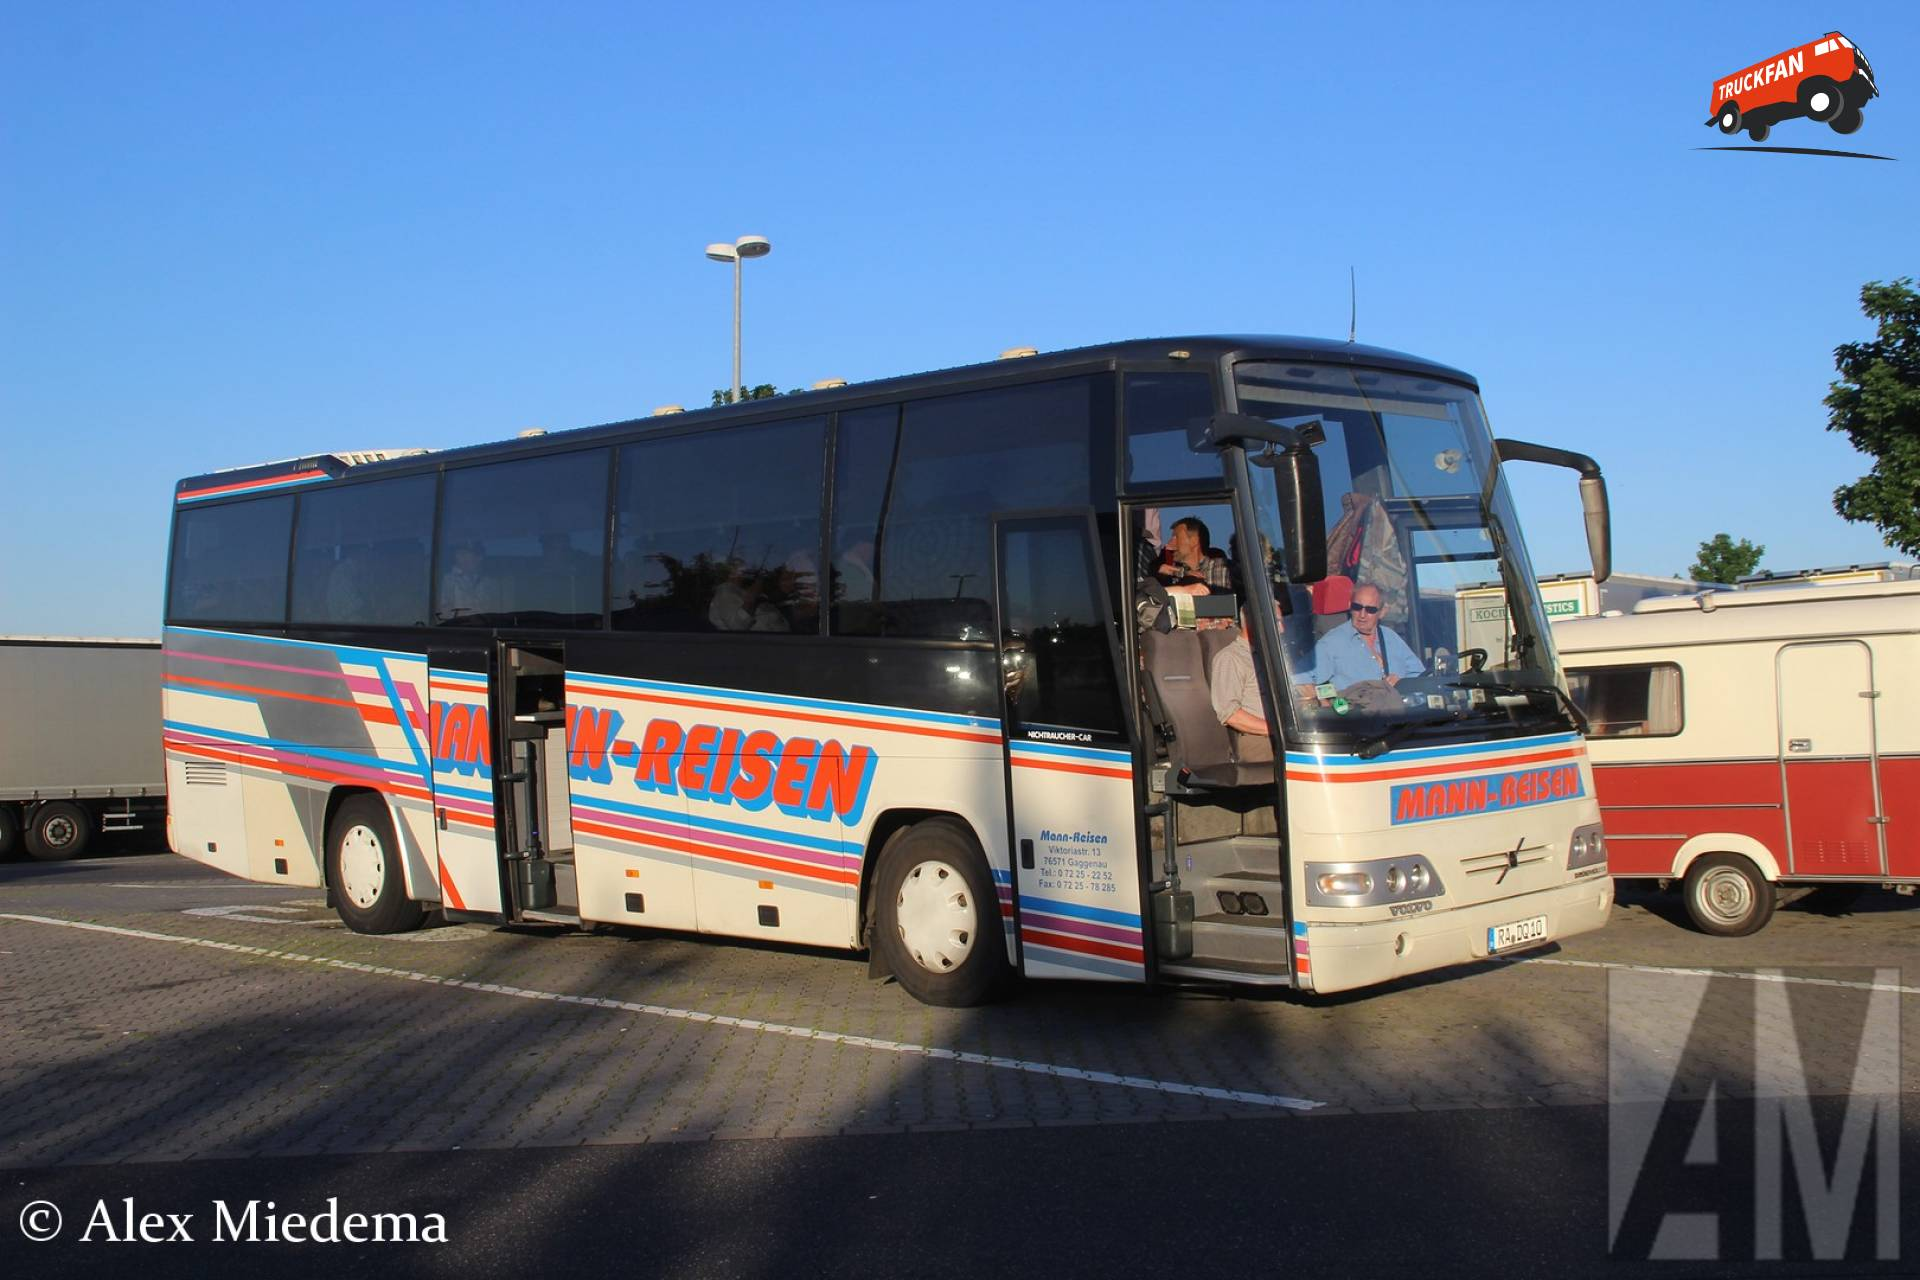 Drögmöller bus